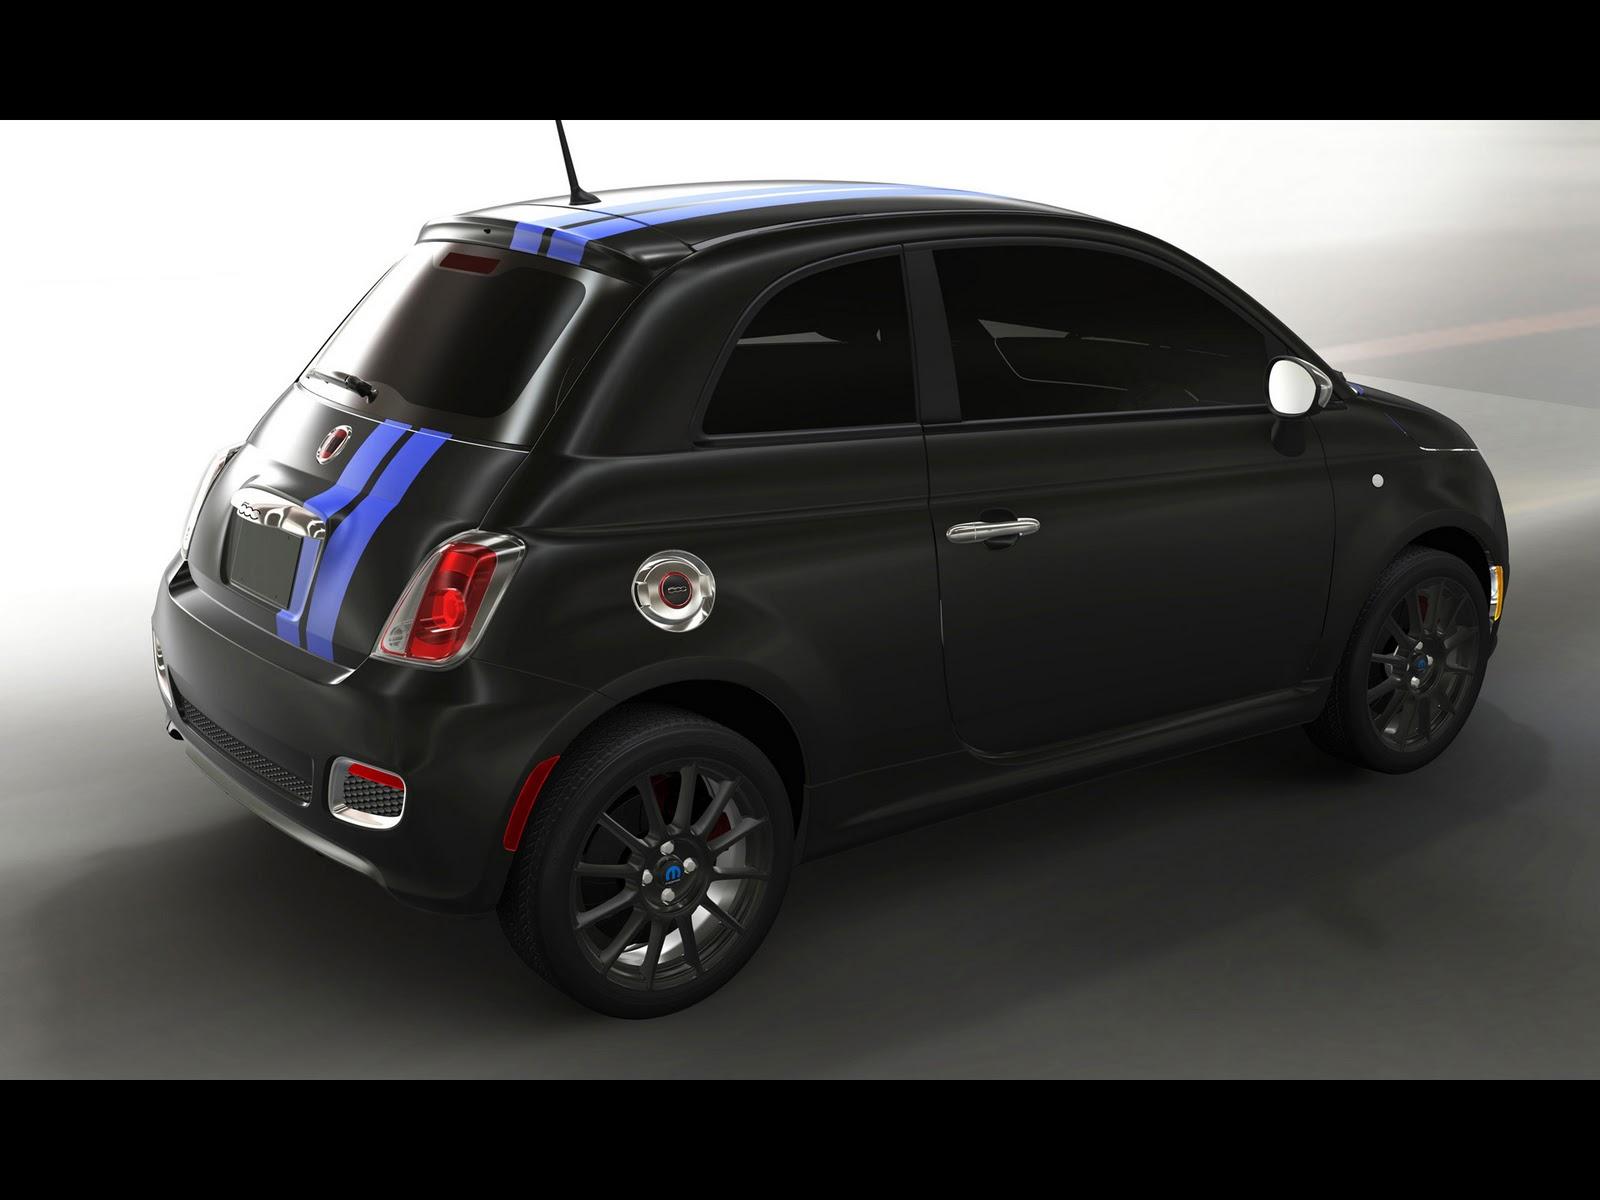 http://2.bp.blogspot.com/_viCh1SFyGrA/TUEzMz81mgI/AAAAAAAAARY/FTX9QvaFhKA/s1600/2012-Fiat-500-by-Mopar-Rear-And-Side-1920x1440.jpg